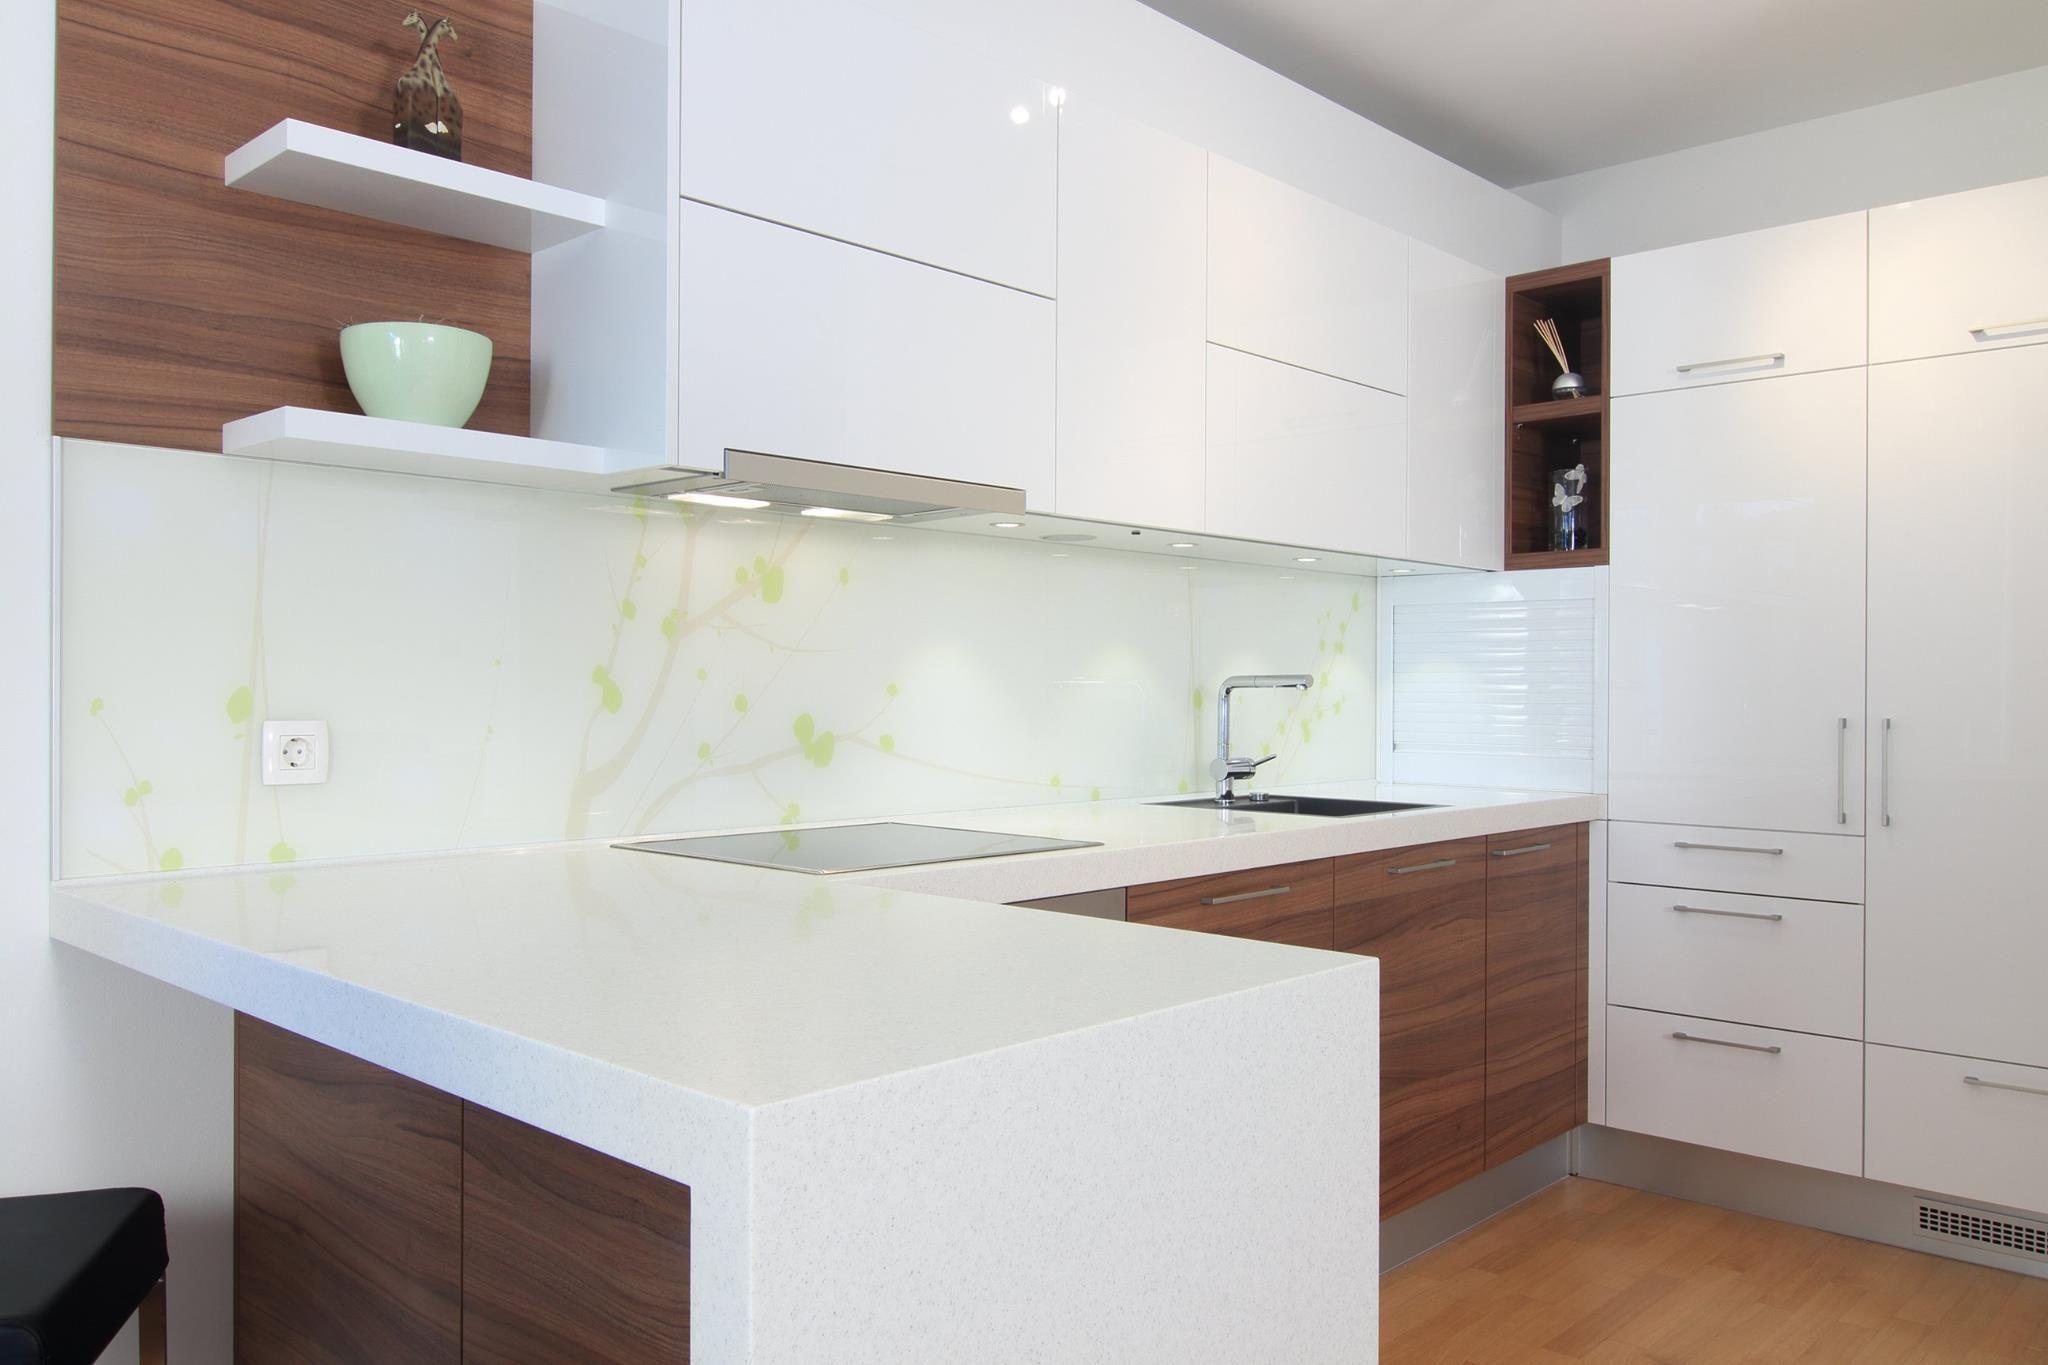 Interior Elegant White Calacatta Marble Kitchen Island With White